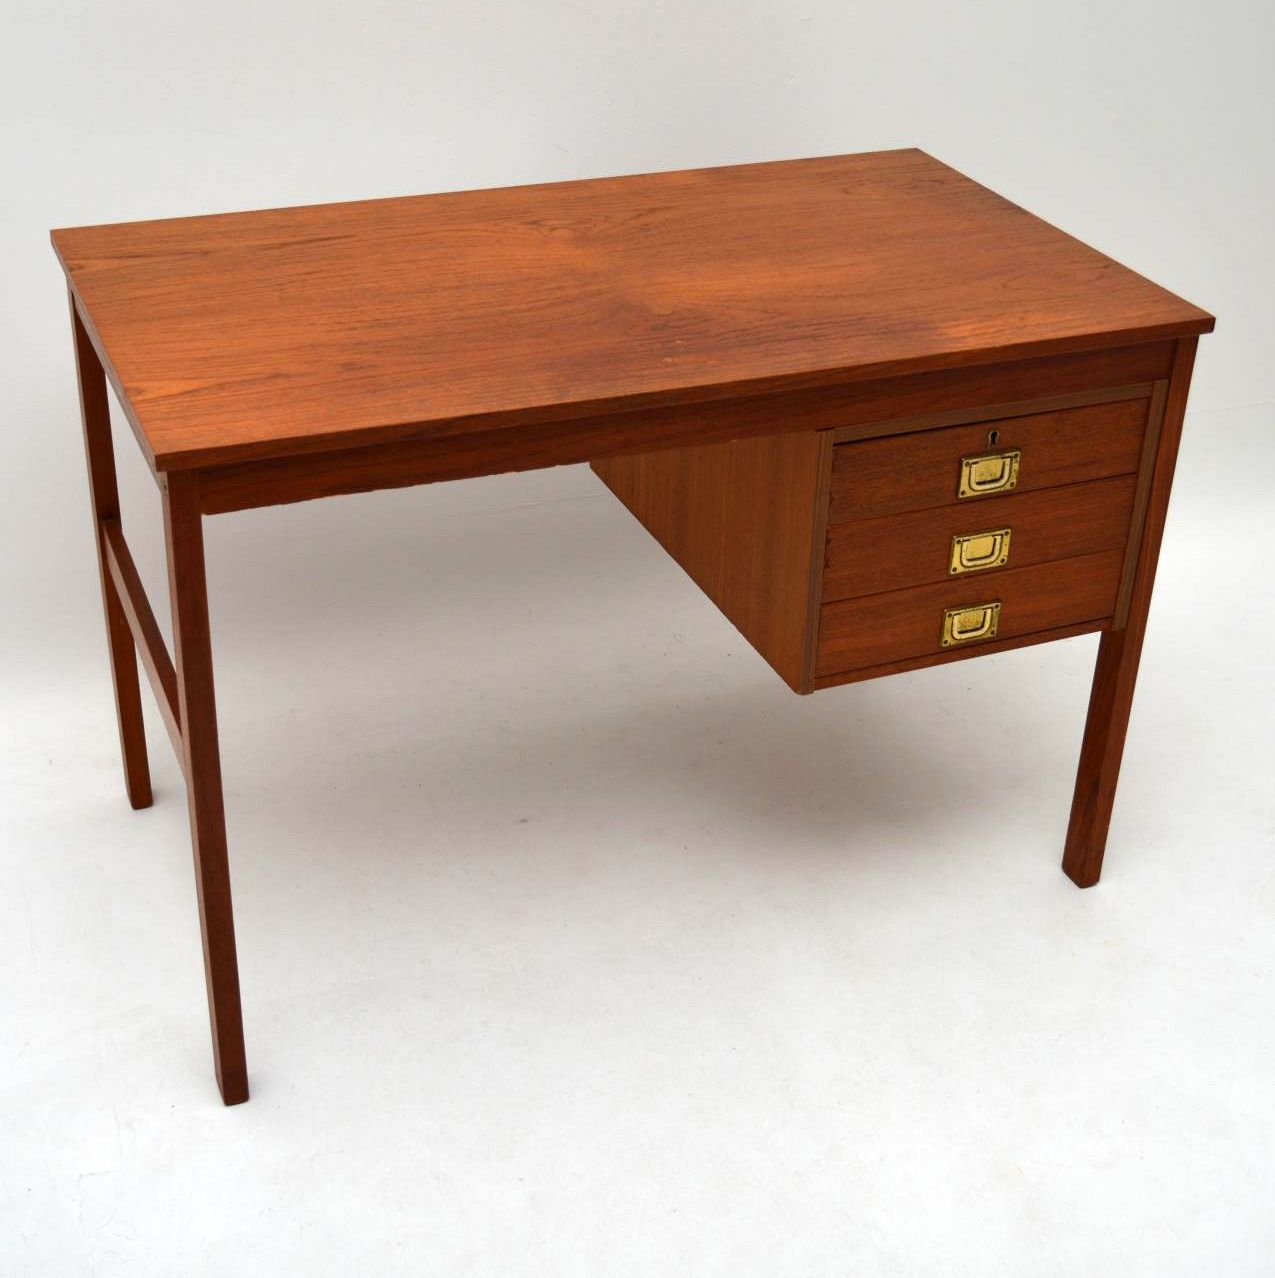 Danish Teak Retro Desk Vintage 1960 S Retrospective